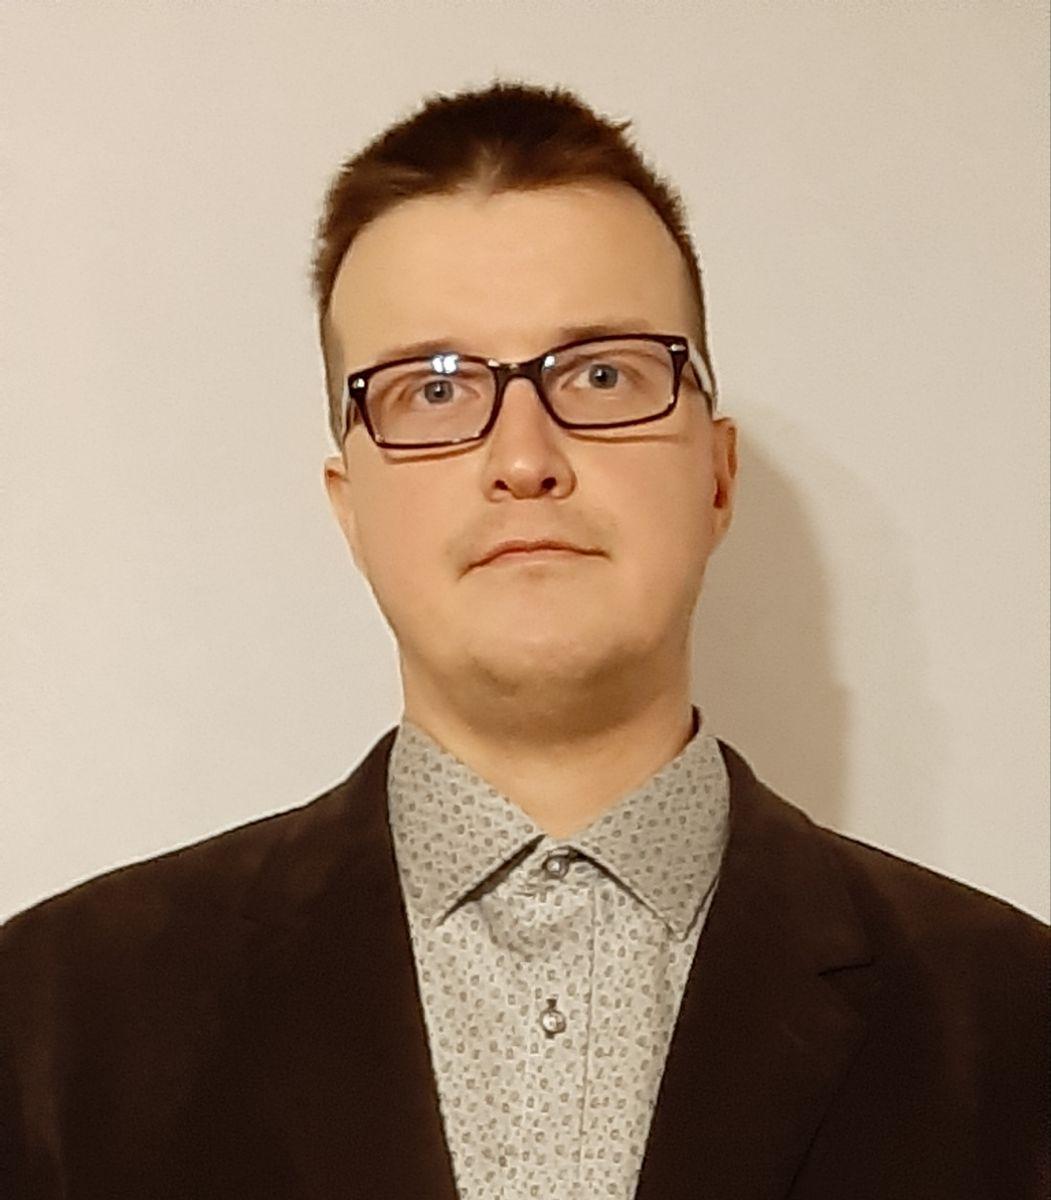 LC-Kiuruvesi pres Sami Piippo